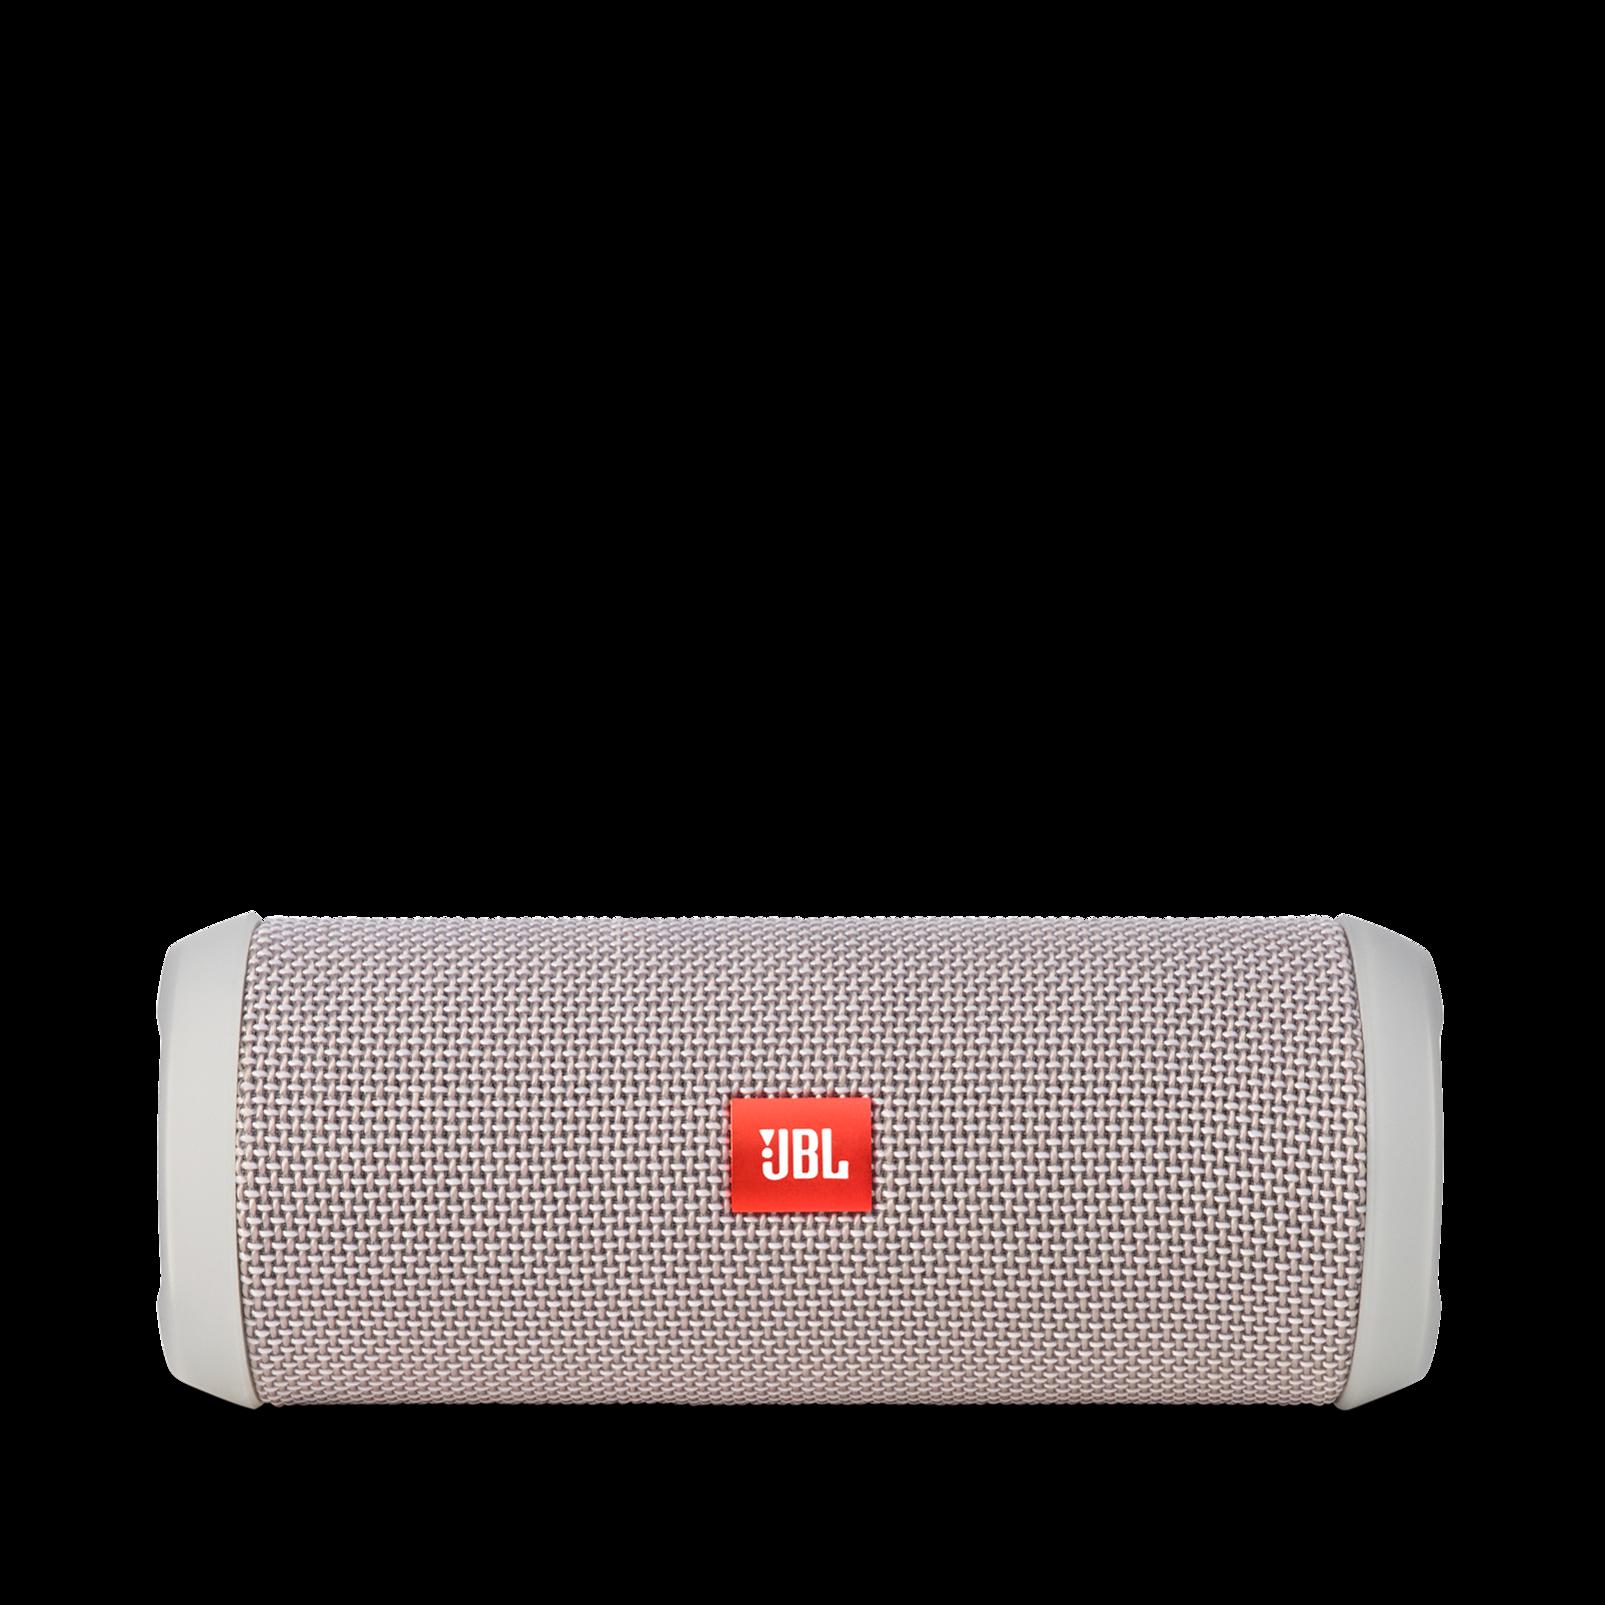 JBL Flip 3 - Grey - Splashproof portable Bluetooth speaker with powerful sound and speakerphone technology - Front